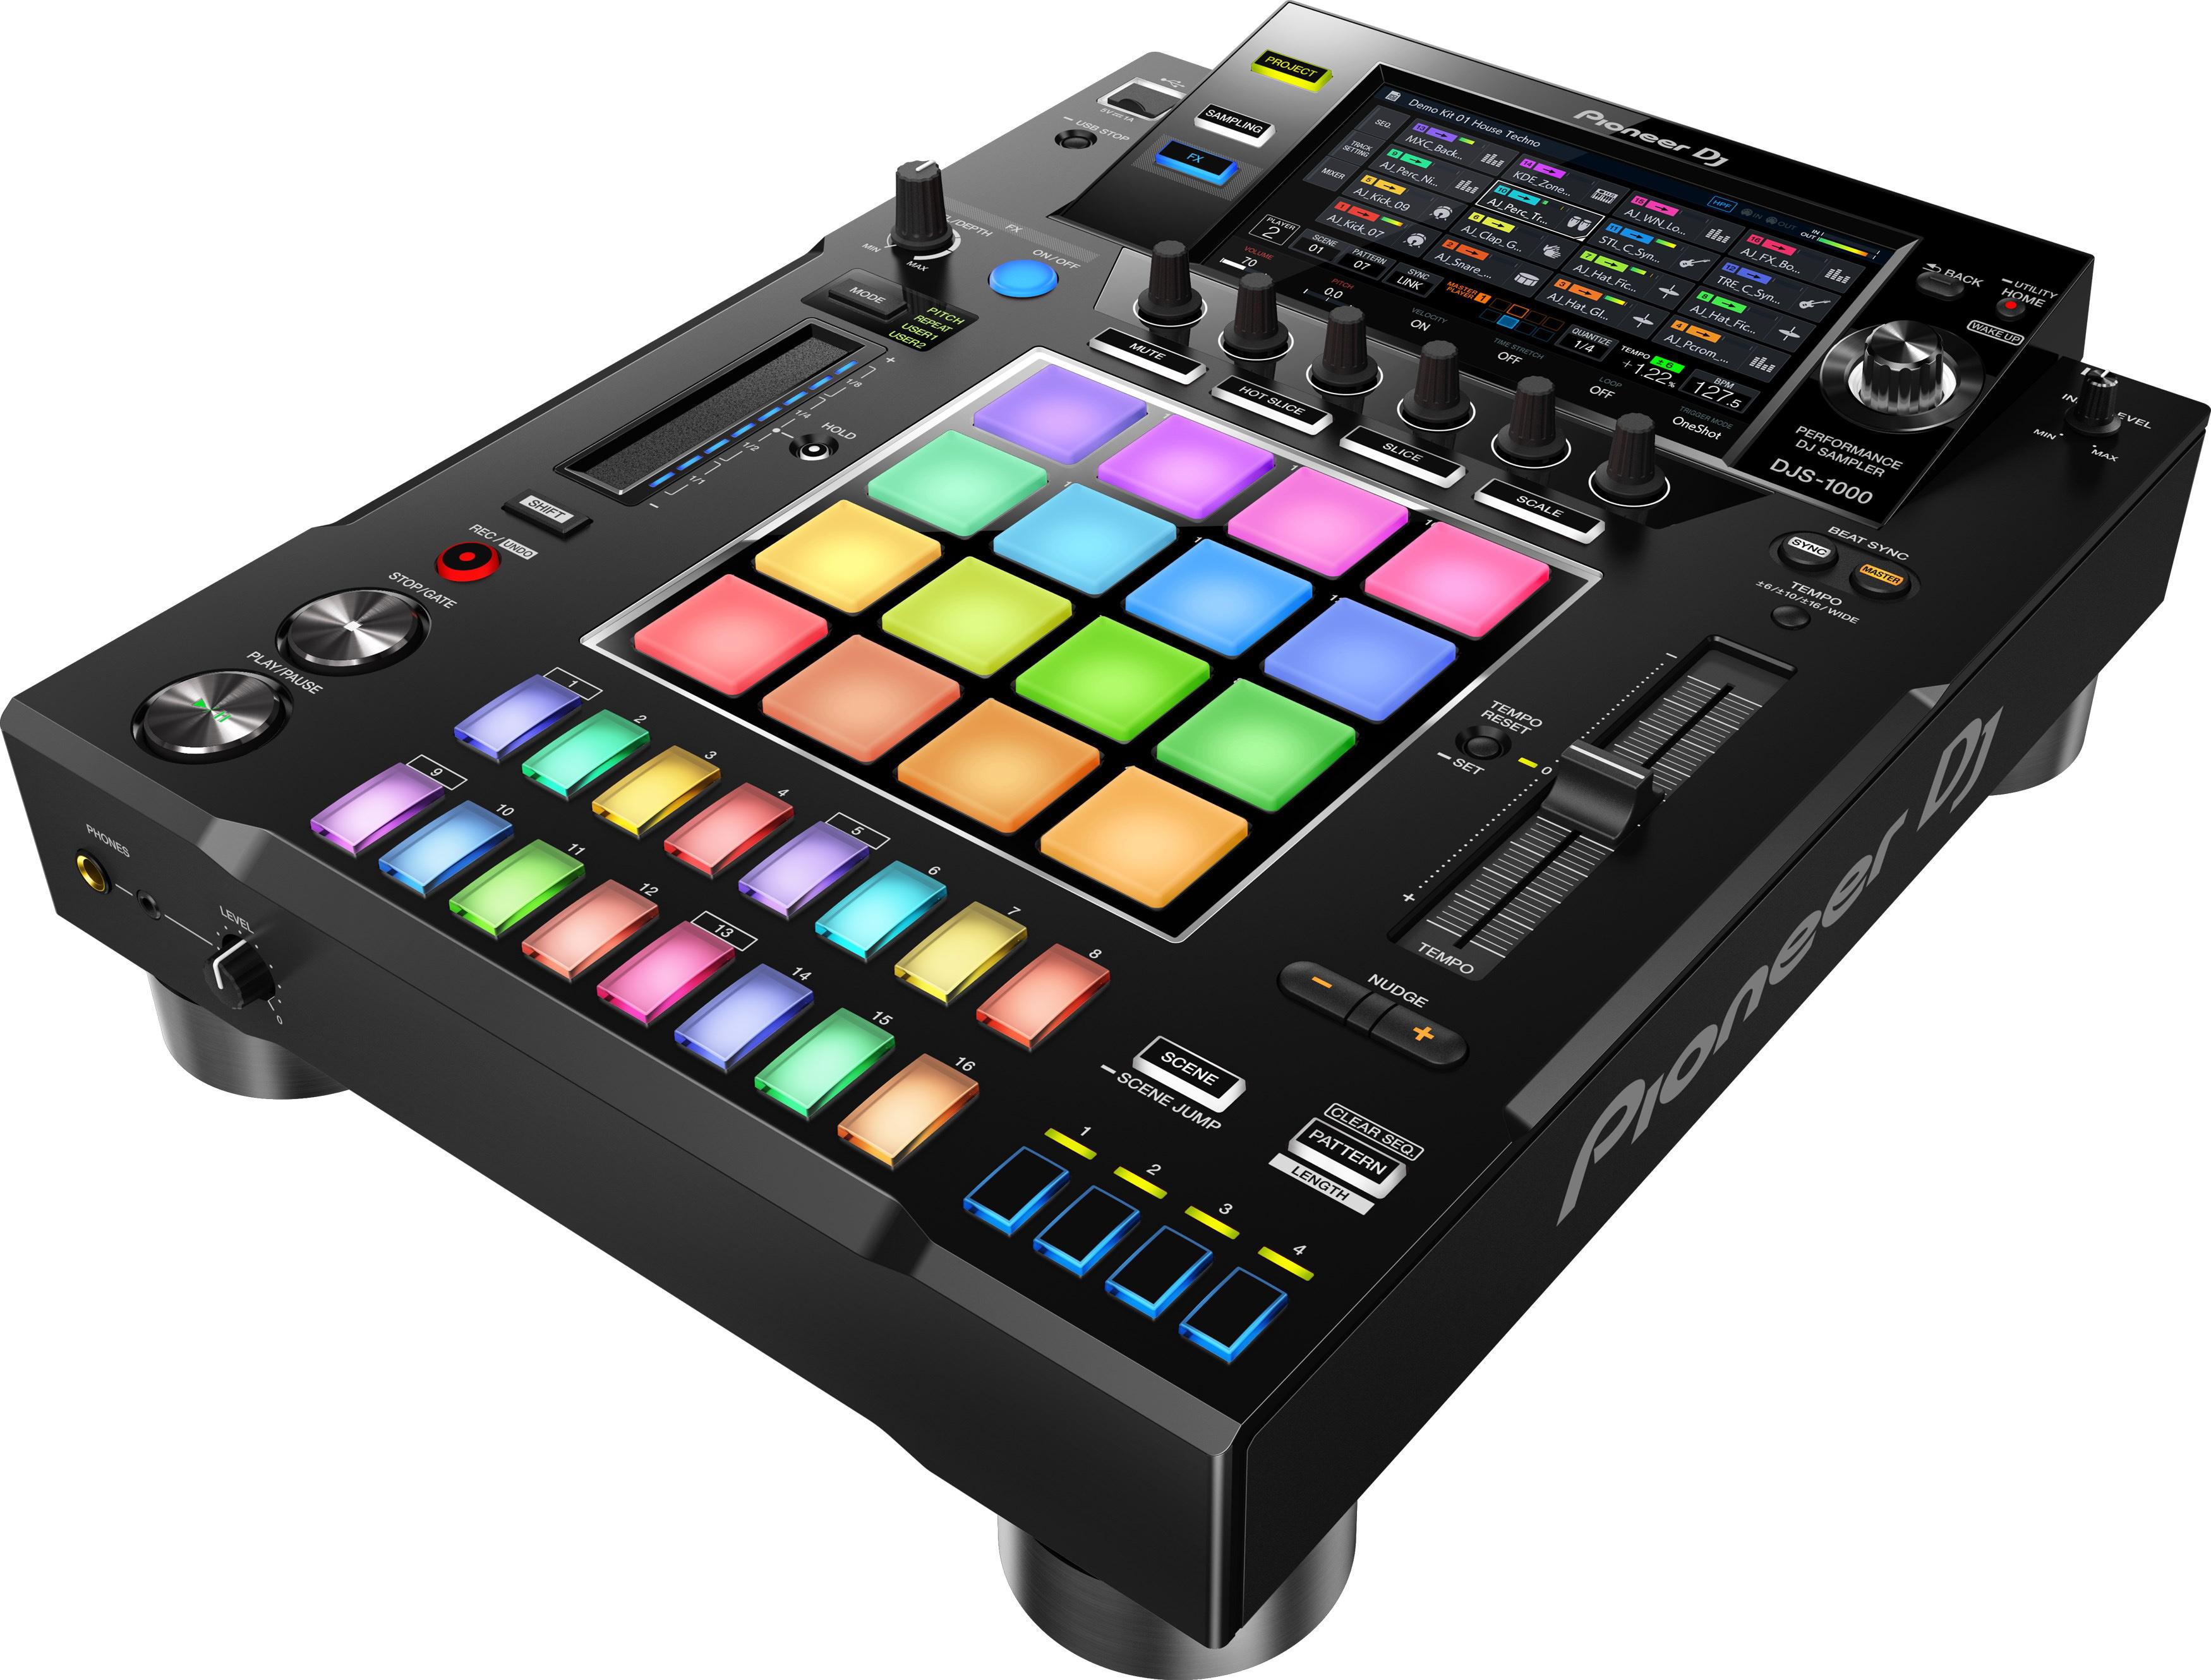 Decksaver DS-PC-DJS1000 Pioneer DJS-1000 DJ Sampler Hard Cover